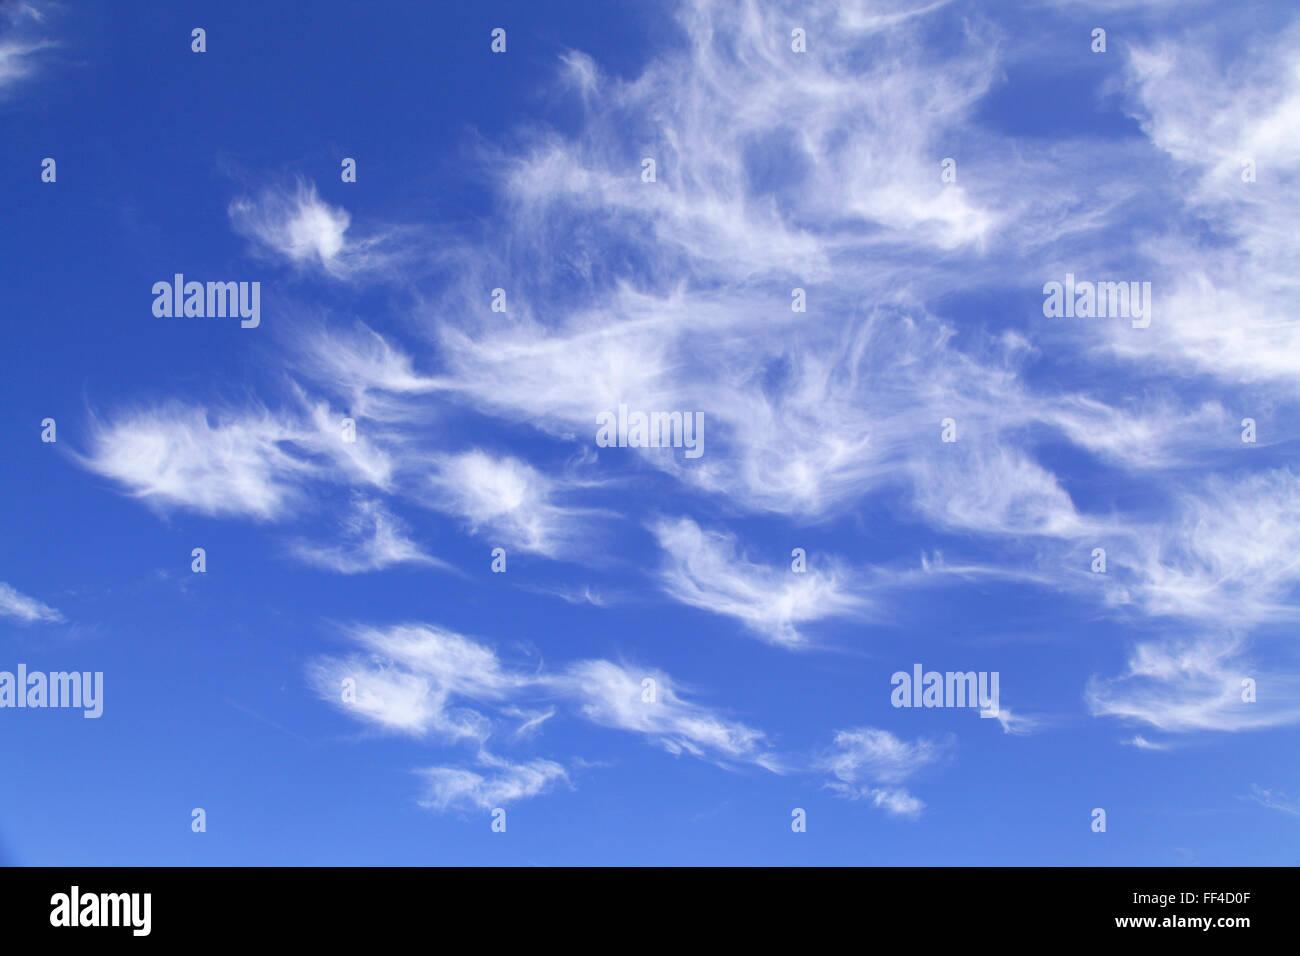 Wispy clouds in a blue sky UK - Stock Image